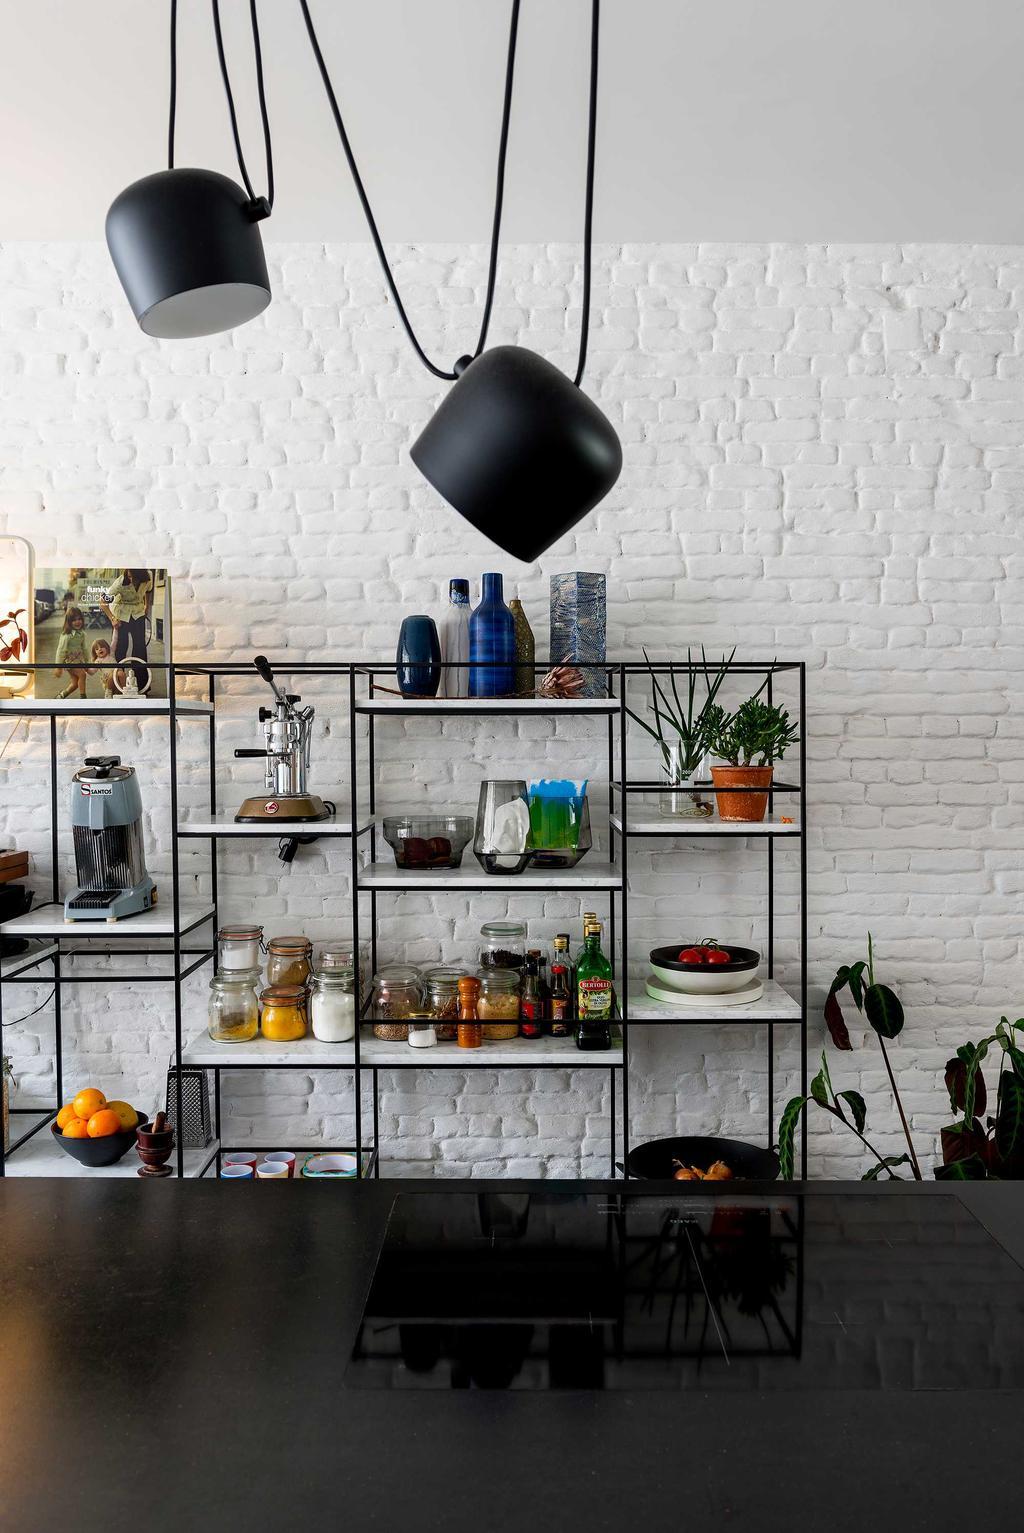 binnenkijker antwerpen keukenkast